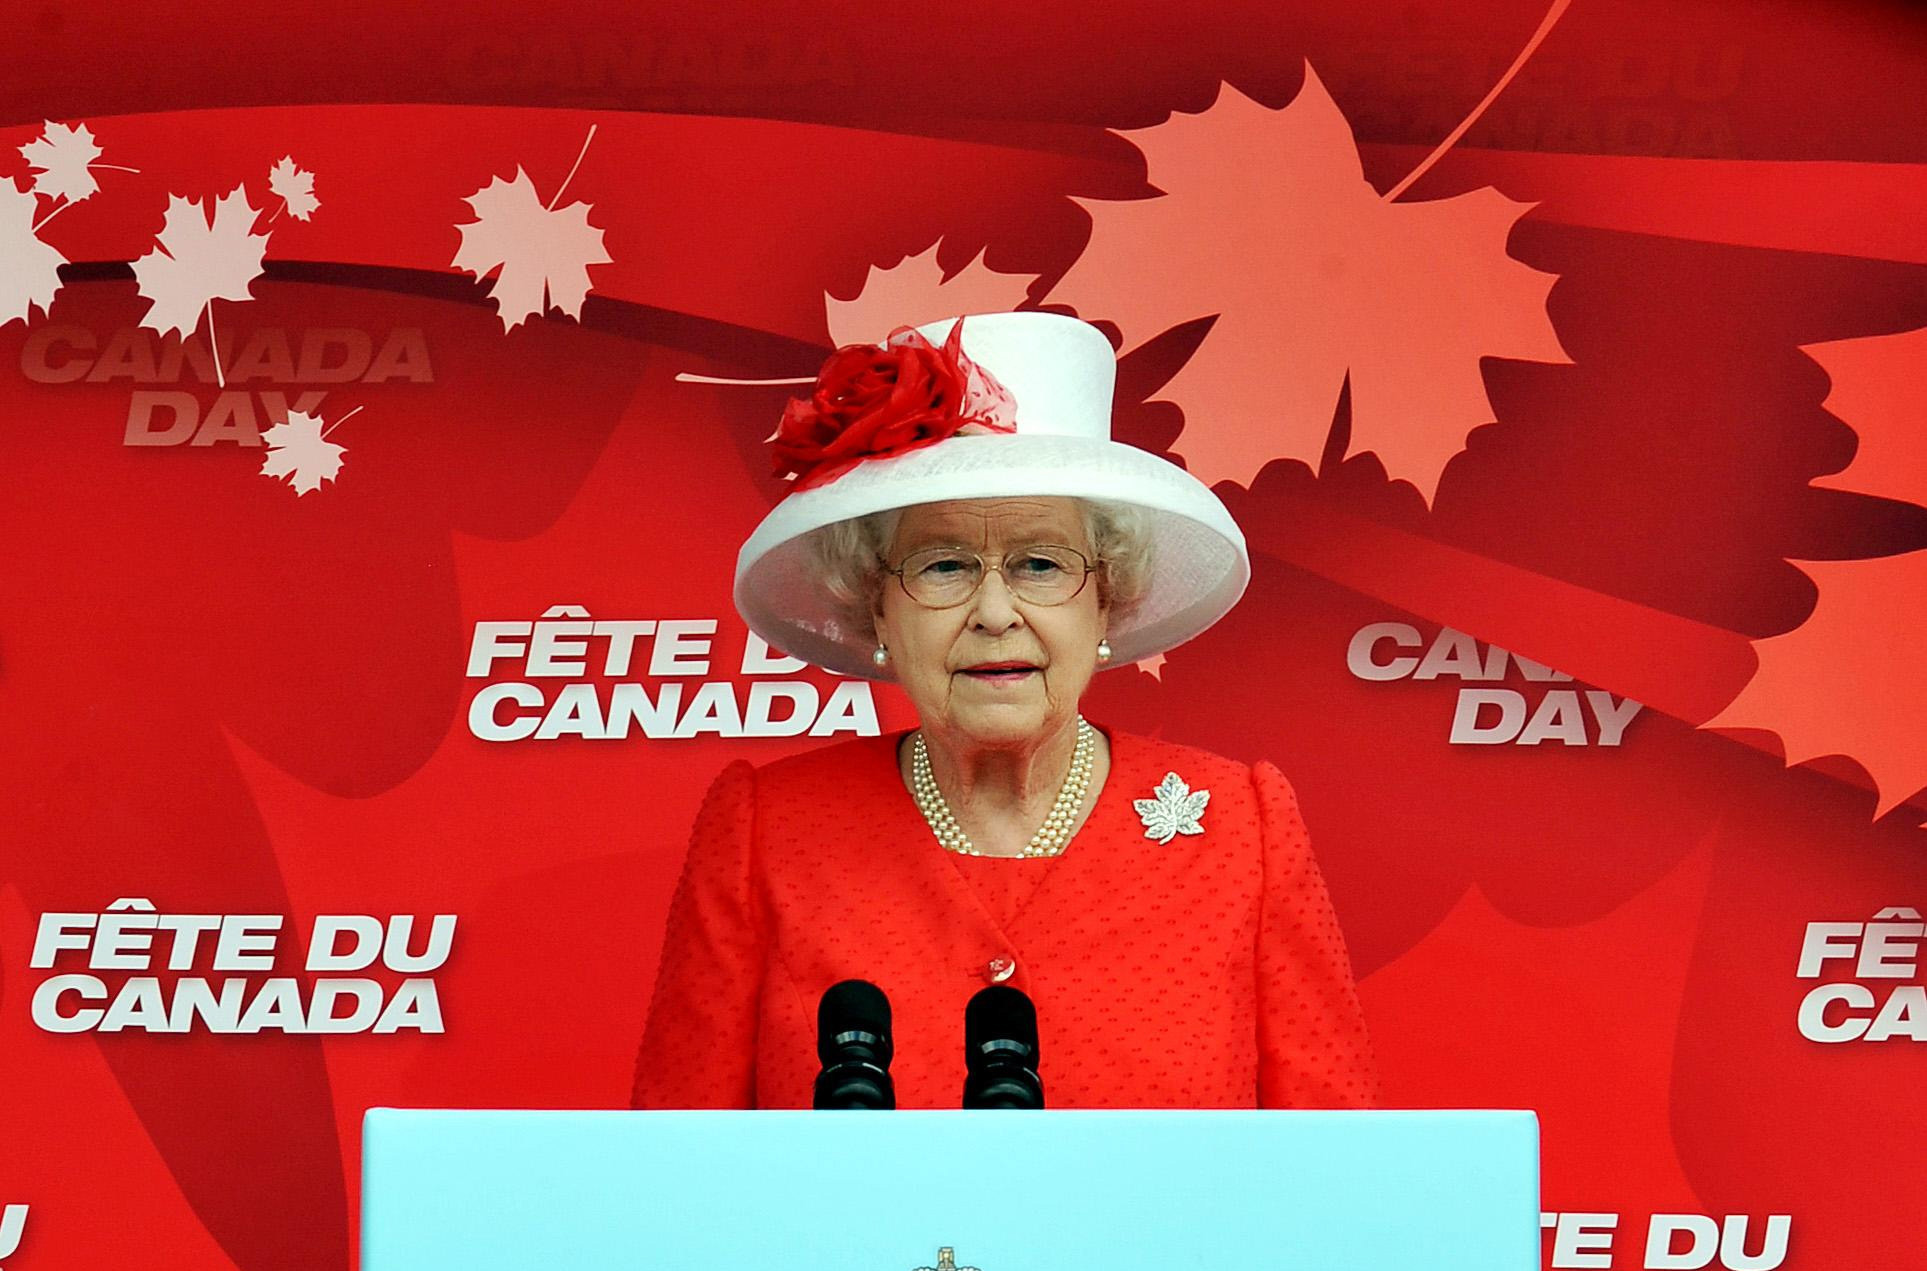 The Queen in Canada